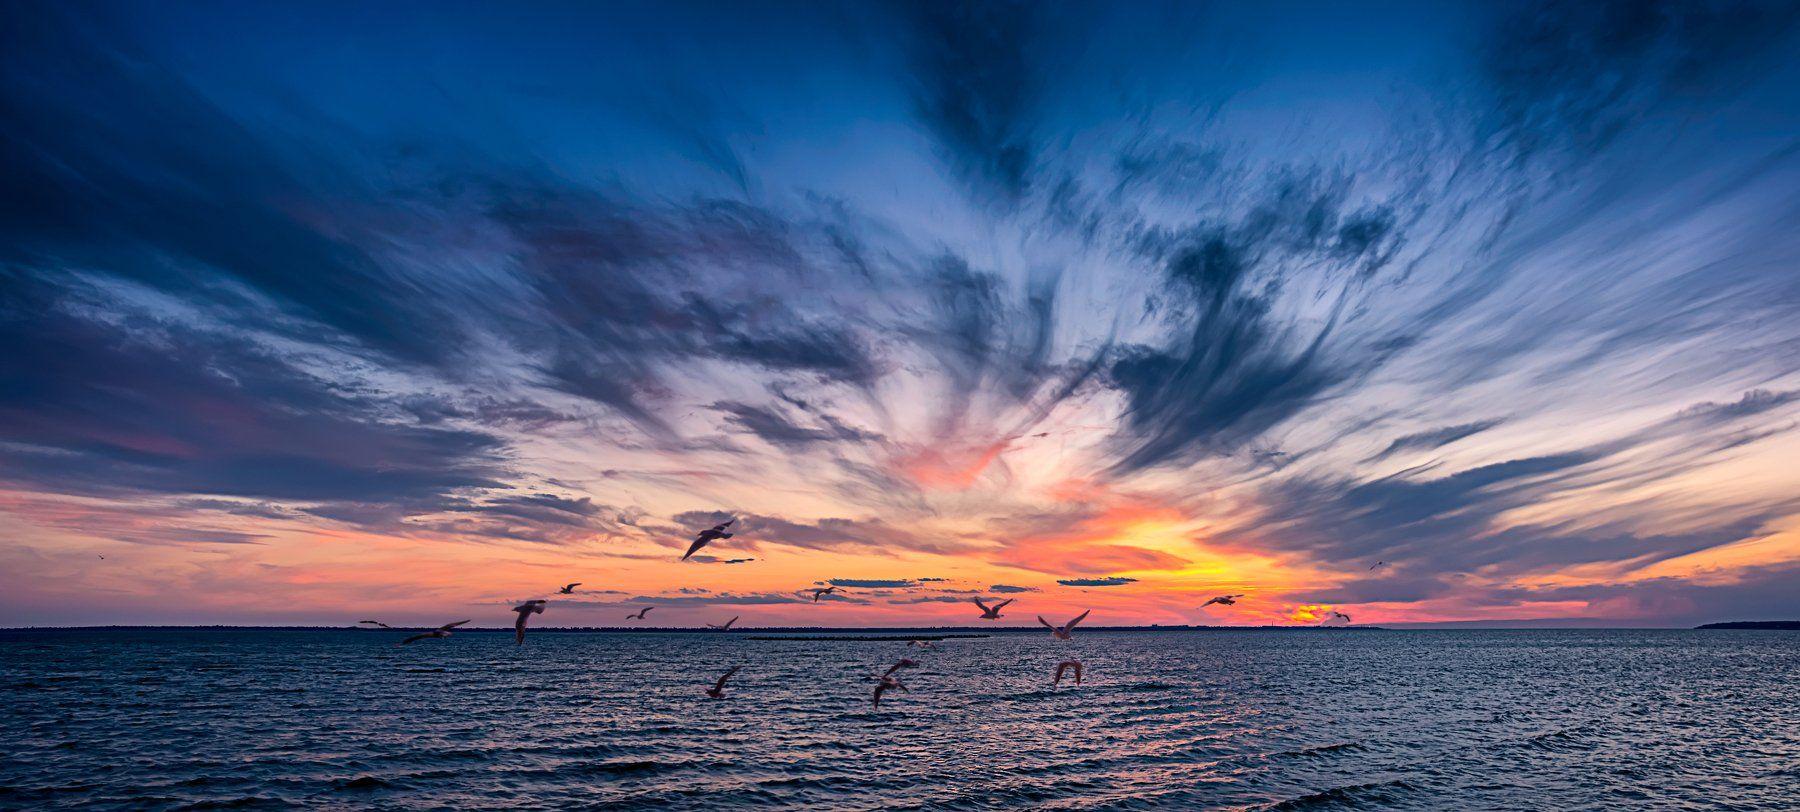 чайки, закат. днестровский лиман, seagulls, sunset, dniester estuary, sky, landscape, sunset, water, cloud, panoramic, Виктор